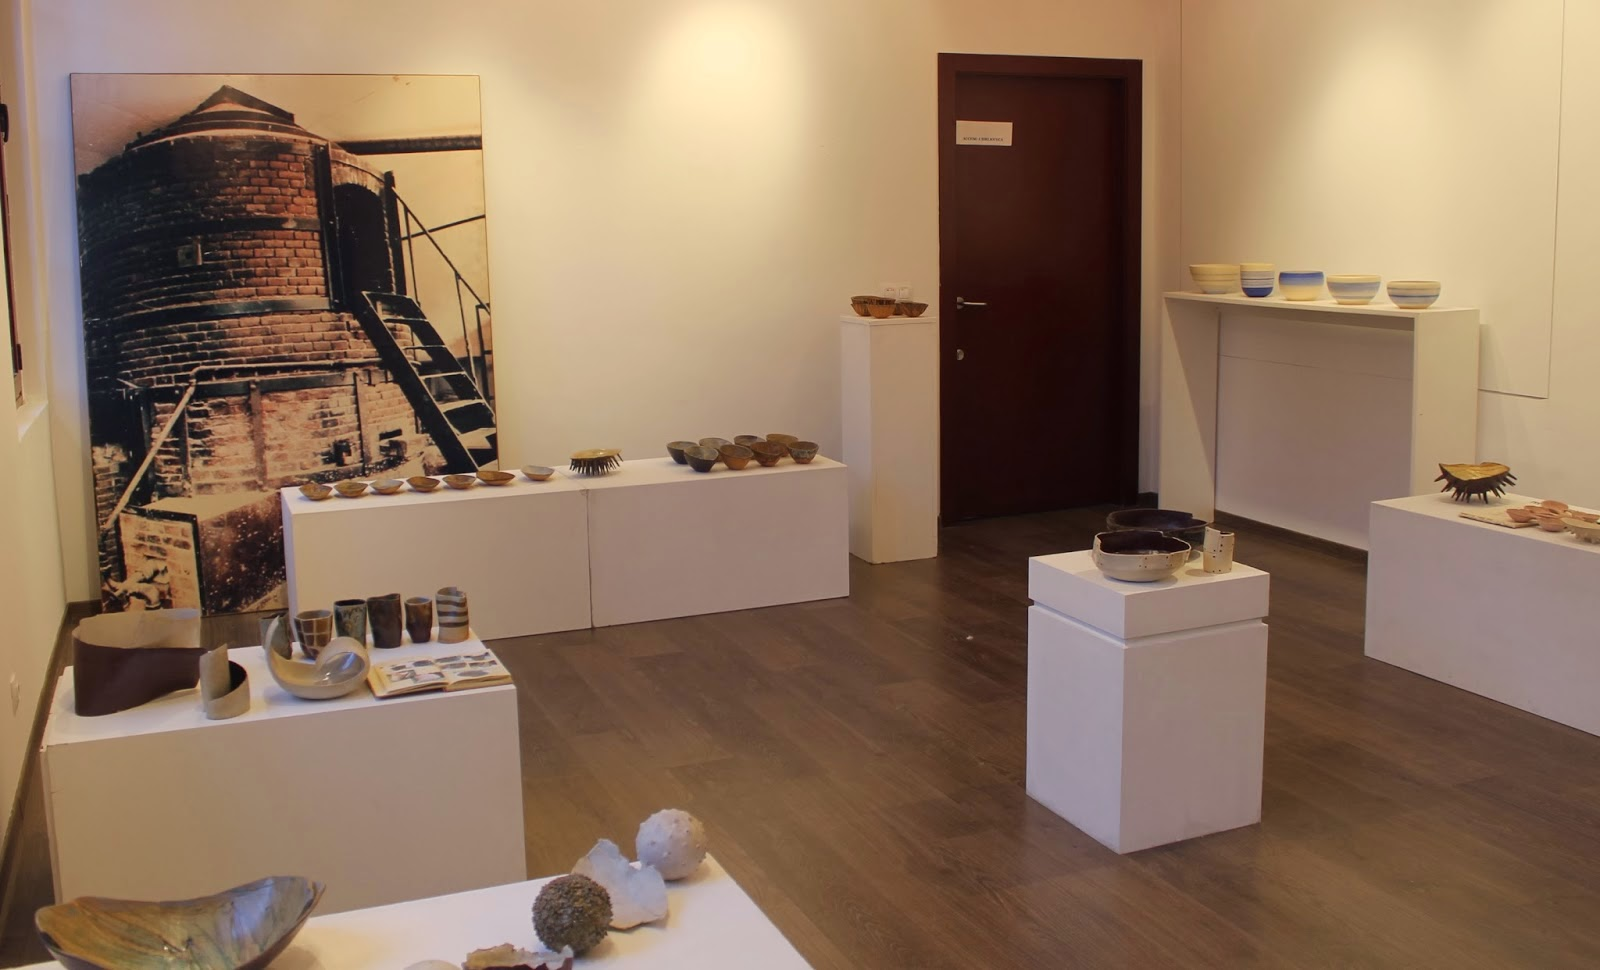 Escuela De Cer Mica De La Moncloa Madrid Exposici N 2